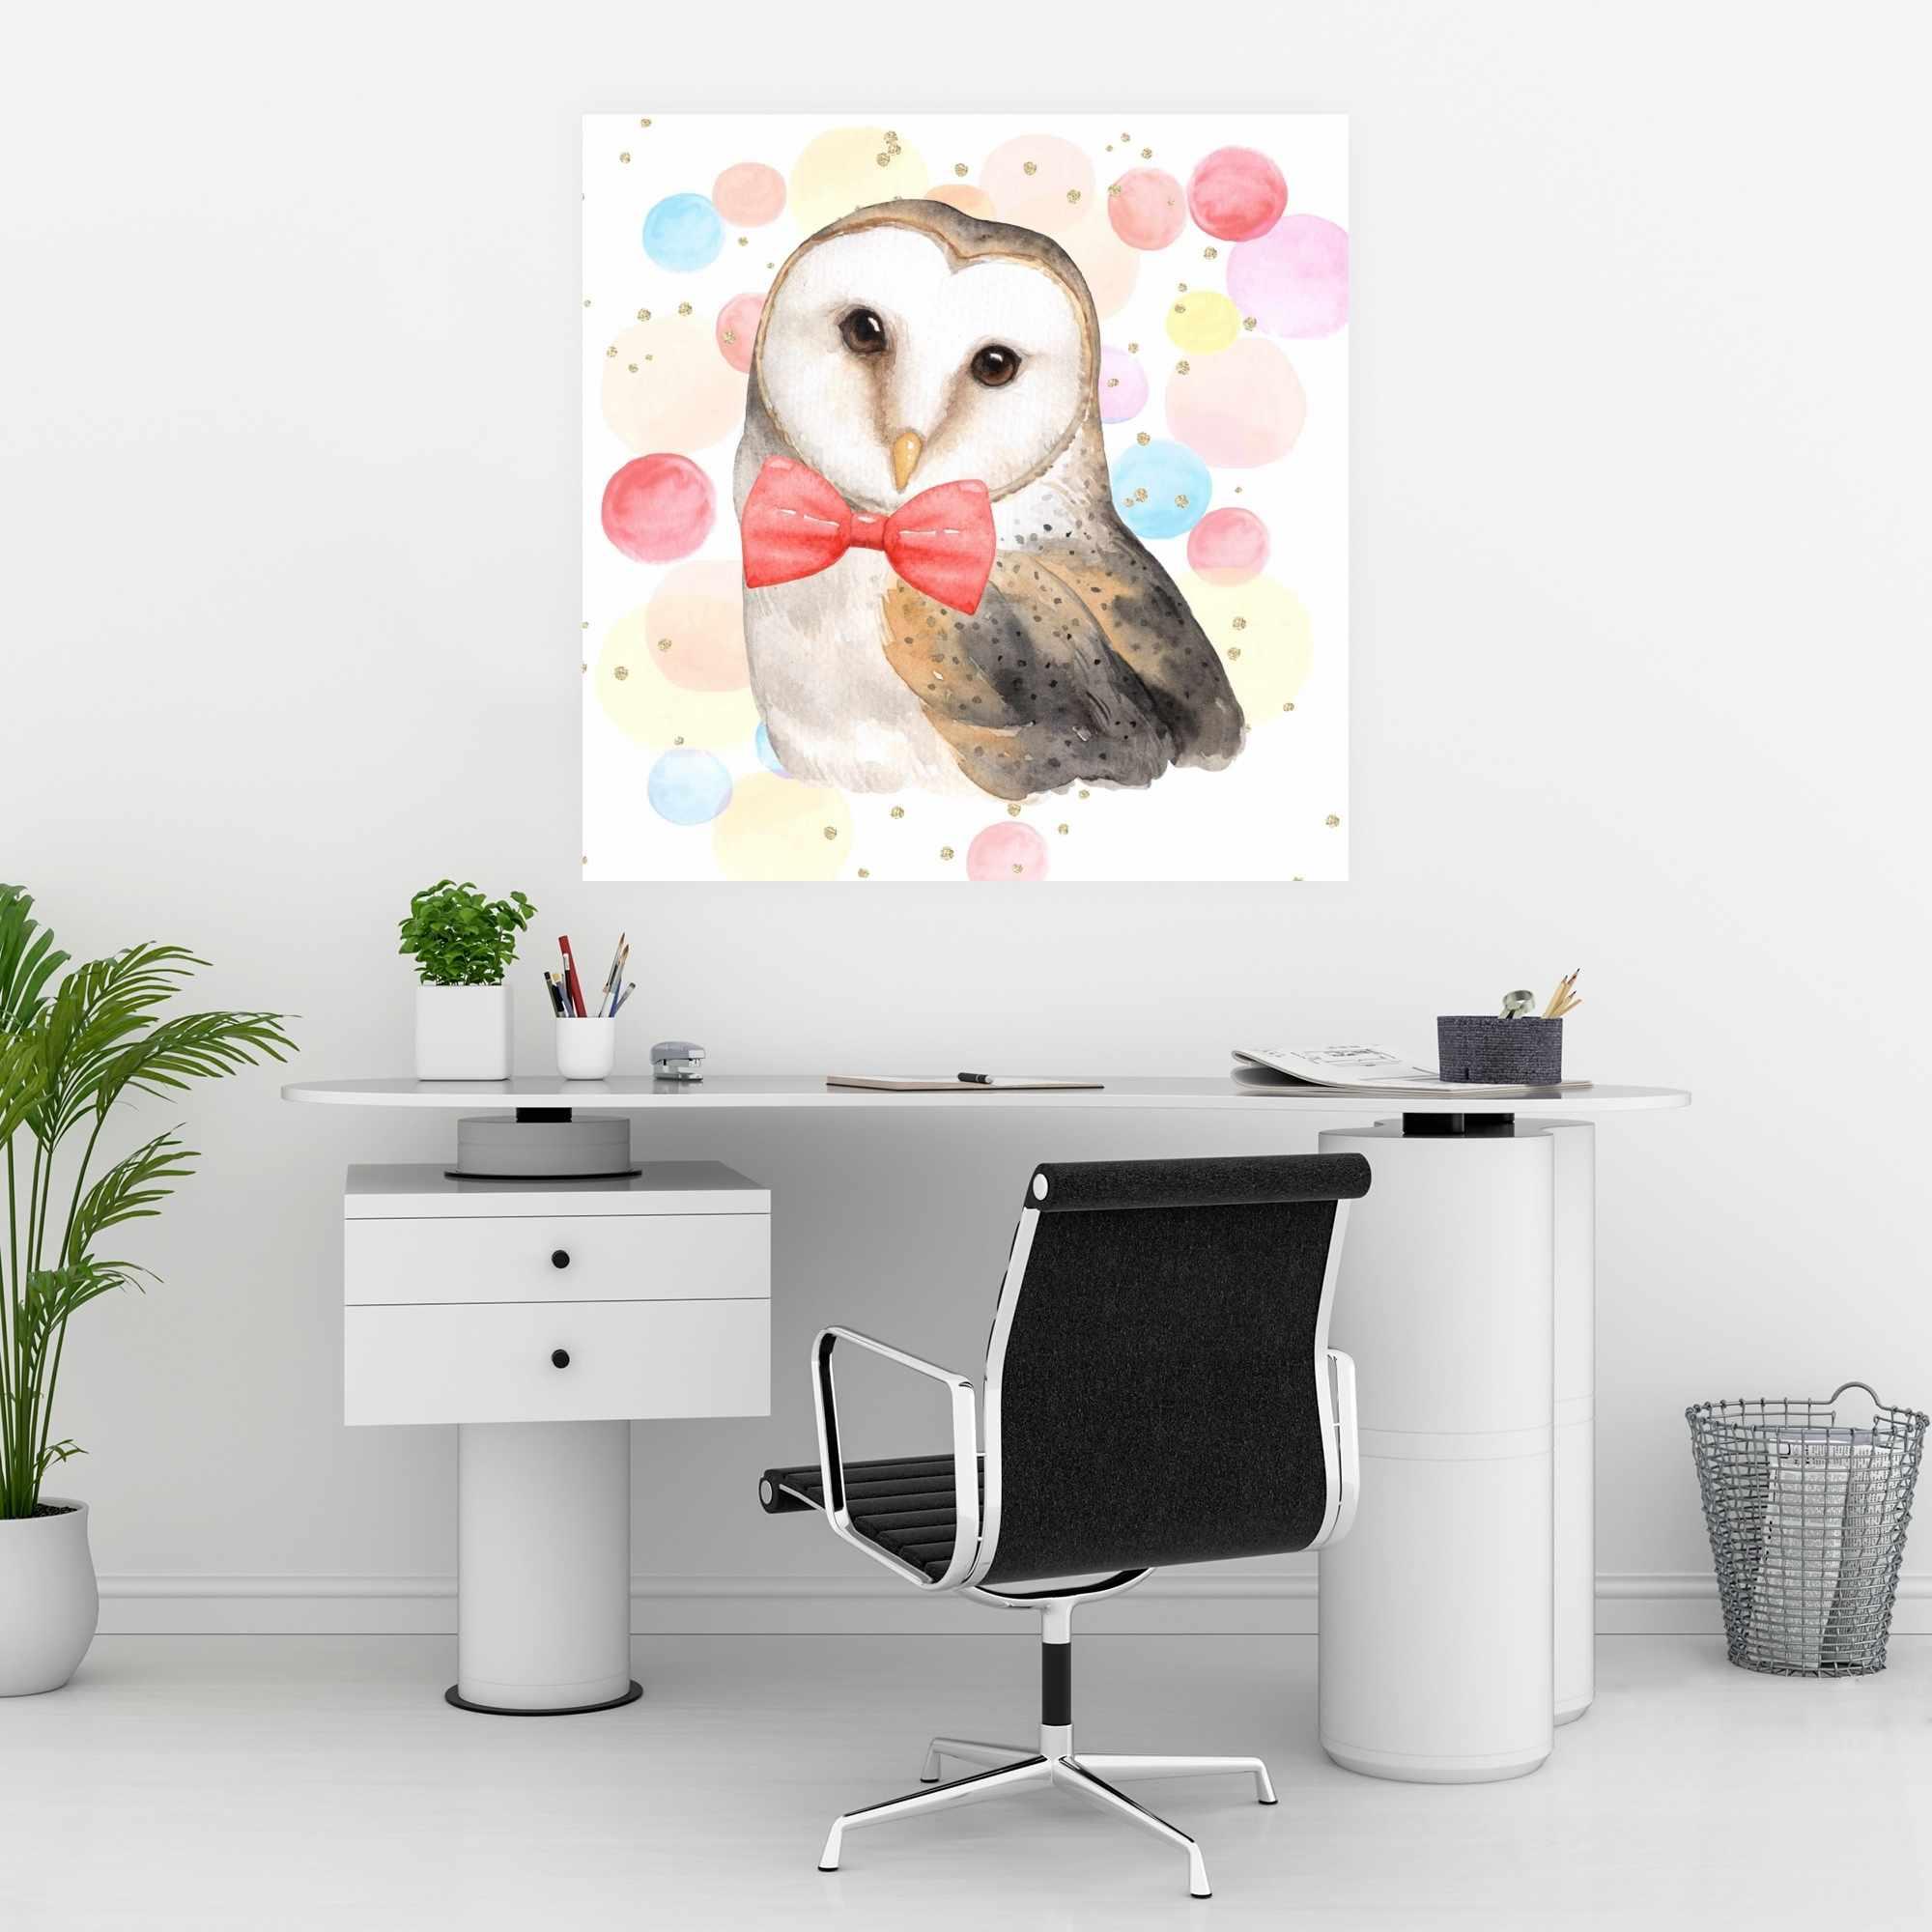 Affiche 30 x 30 - Chic hibou